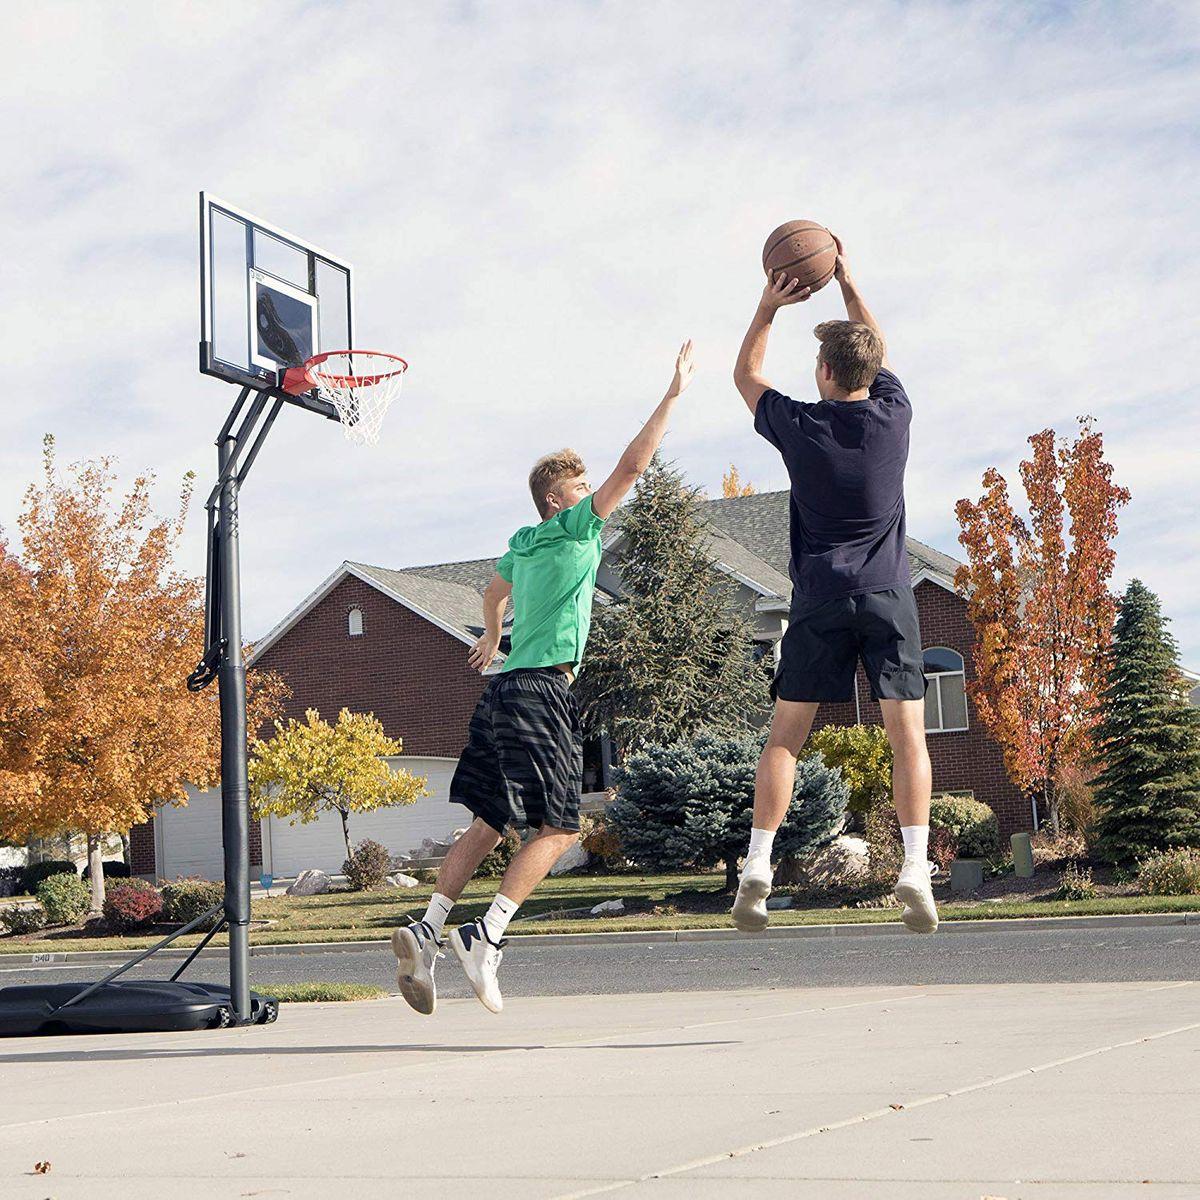 6 Best Basketball Hoops 2019 The Strategist New York Magazine